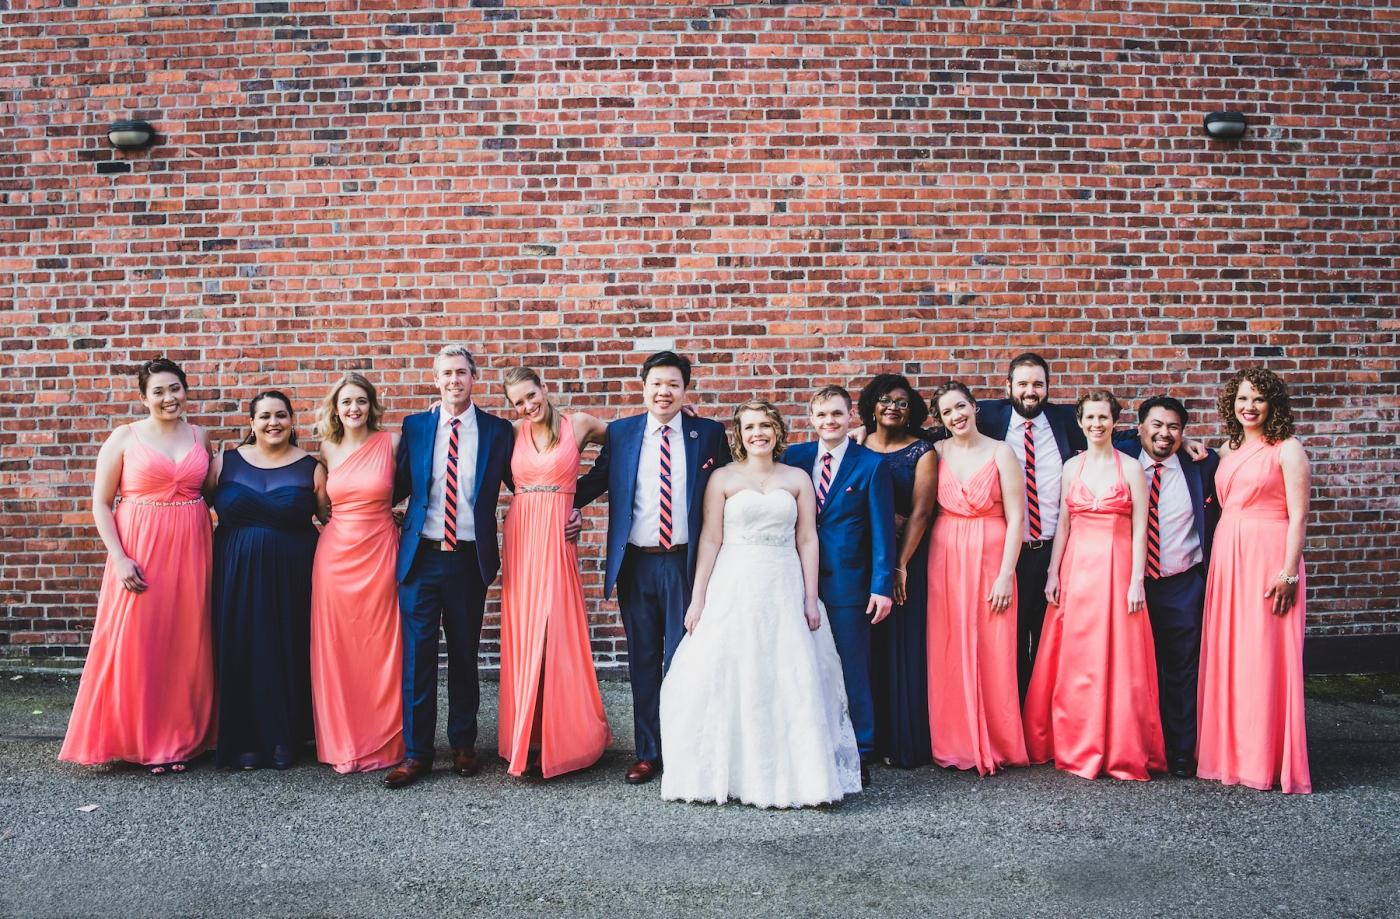 DSC_2159Everett_Wedding_Ballroom_Jane_Speleers_photography_Rachel_and_Edmund_Bridesmaids_peach_dresses_groomsmen_2017